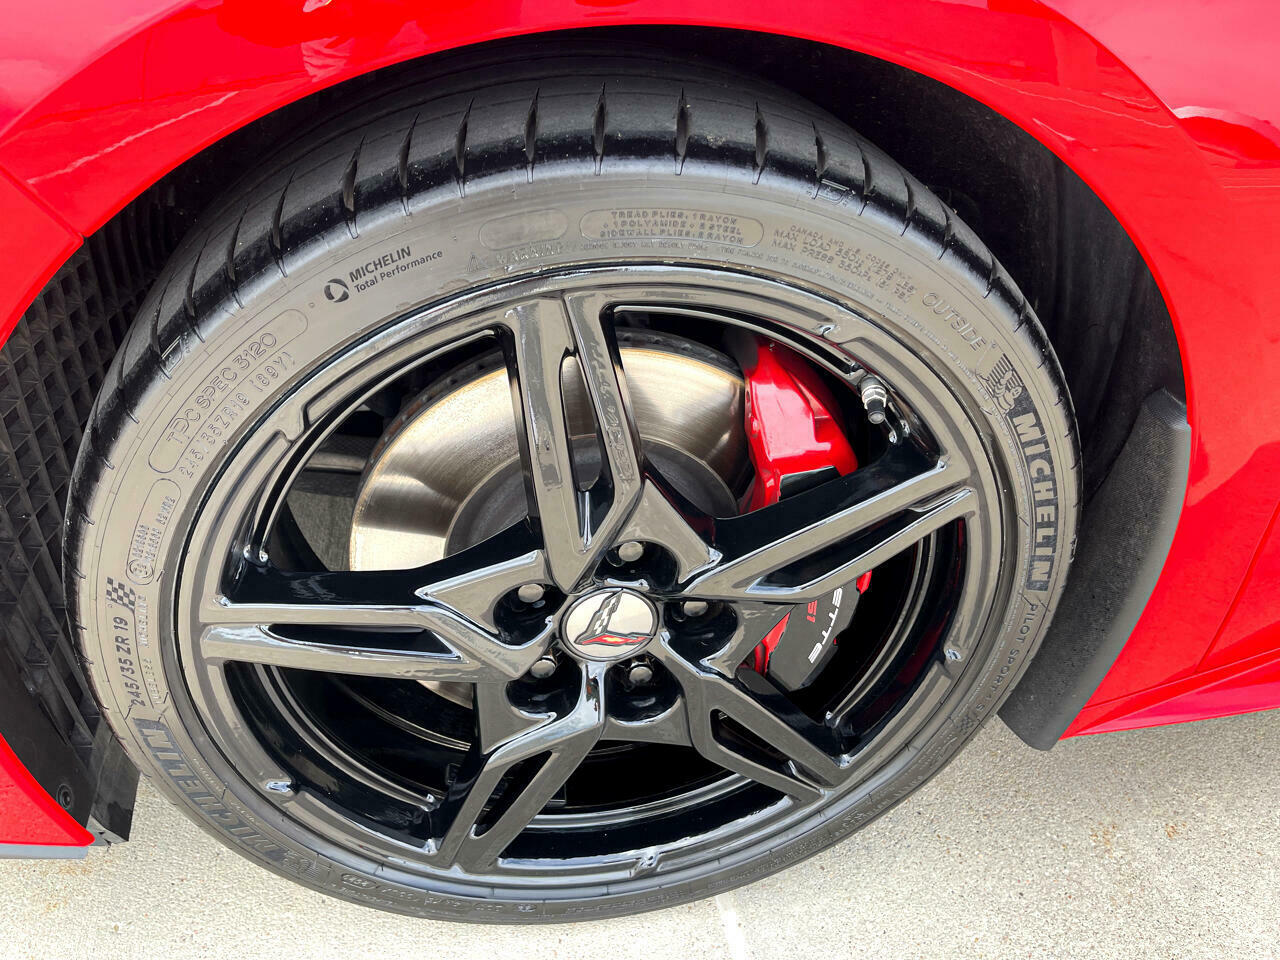 2020 Red Chevrolet Corvette Coupe 1LT | C7 Corvette Photo 10